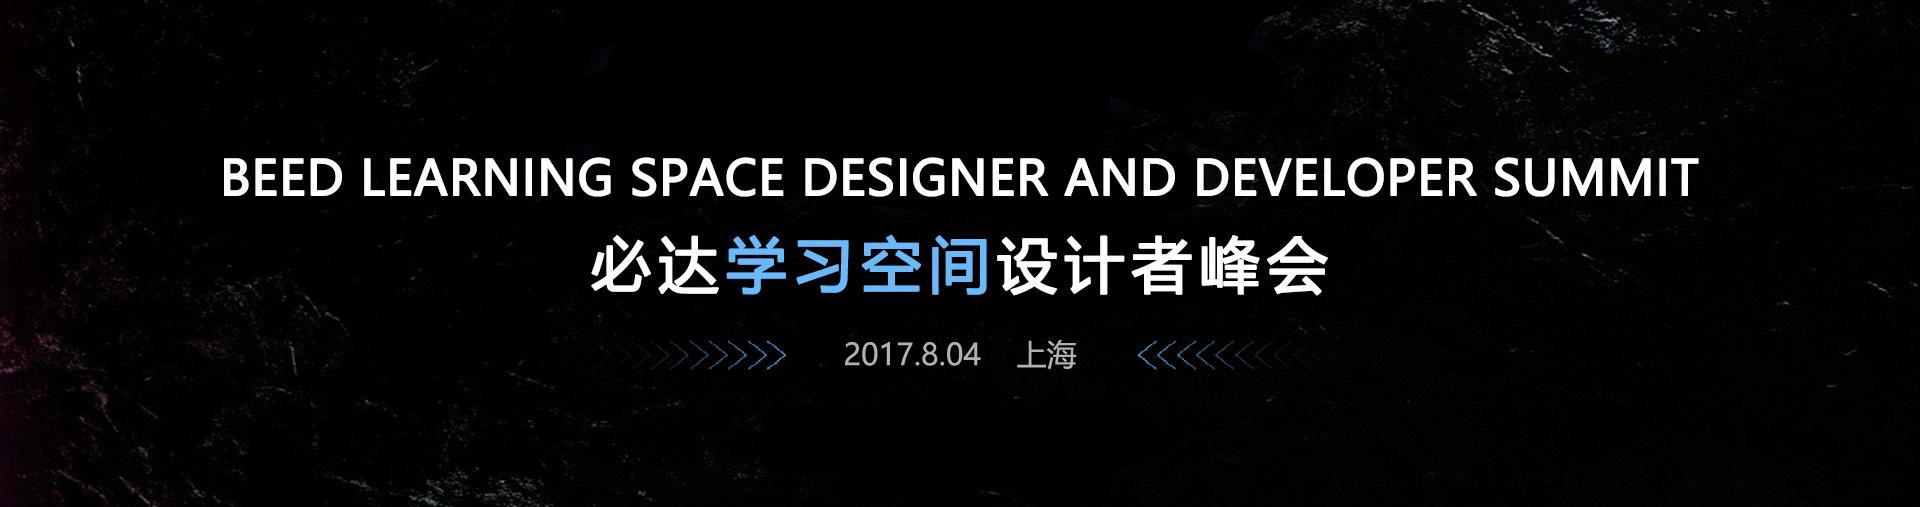 必达学习空间设计者峰会 BEED LEARNING SPACE DESIGNER AND DEVELOPER SUMMIT